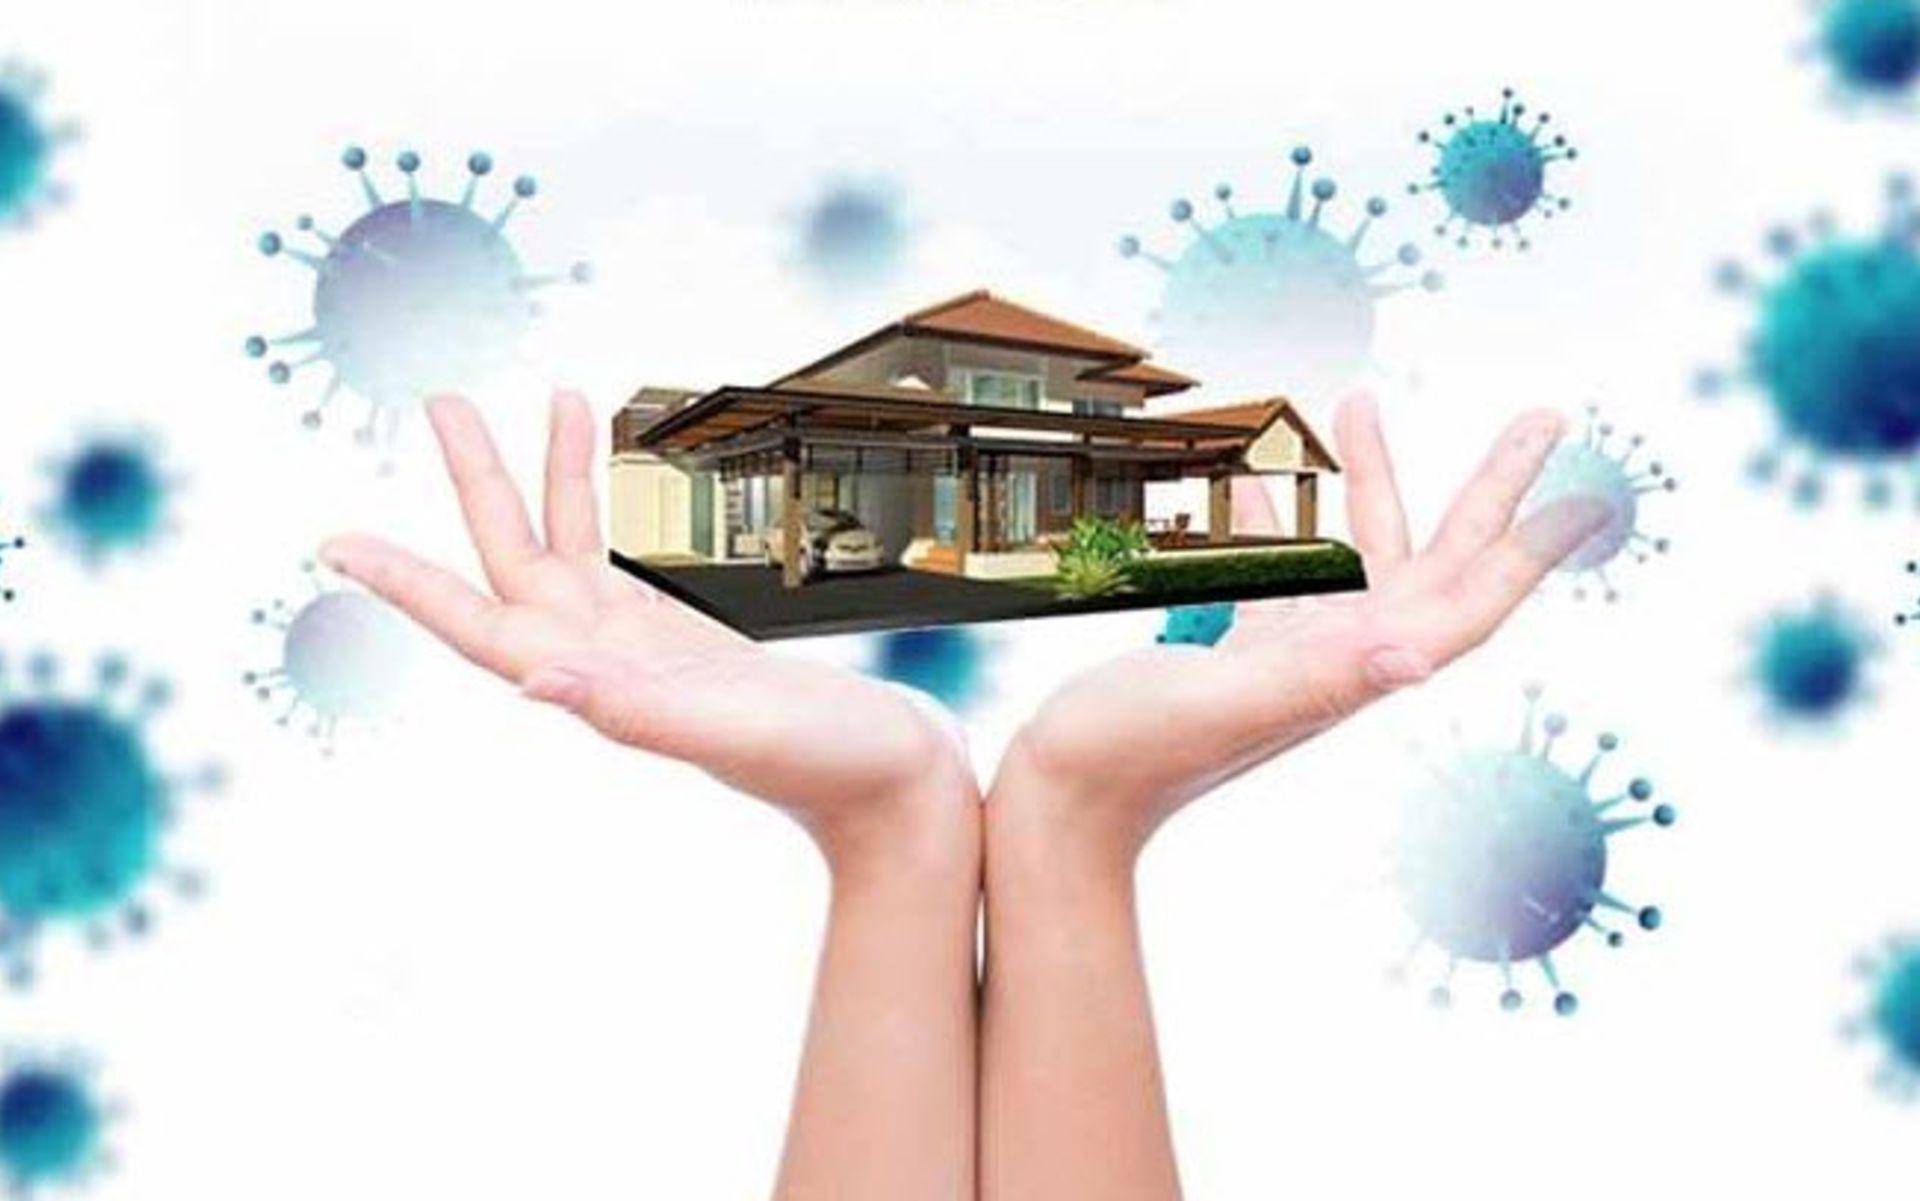 The Impact of Coronavirus on Real Estate Markets